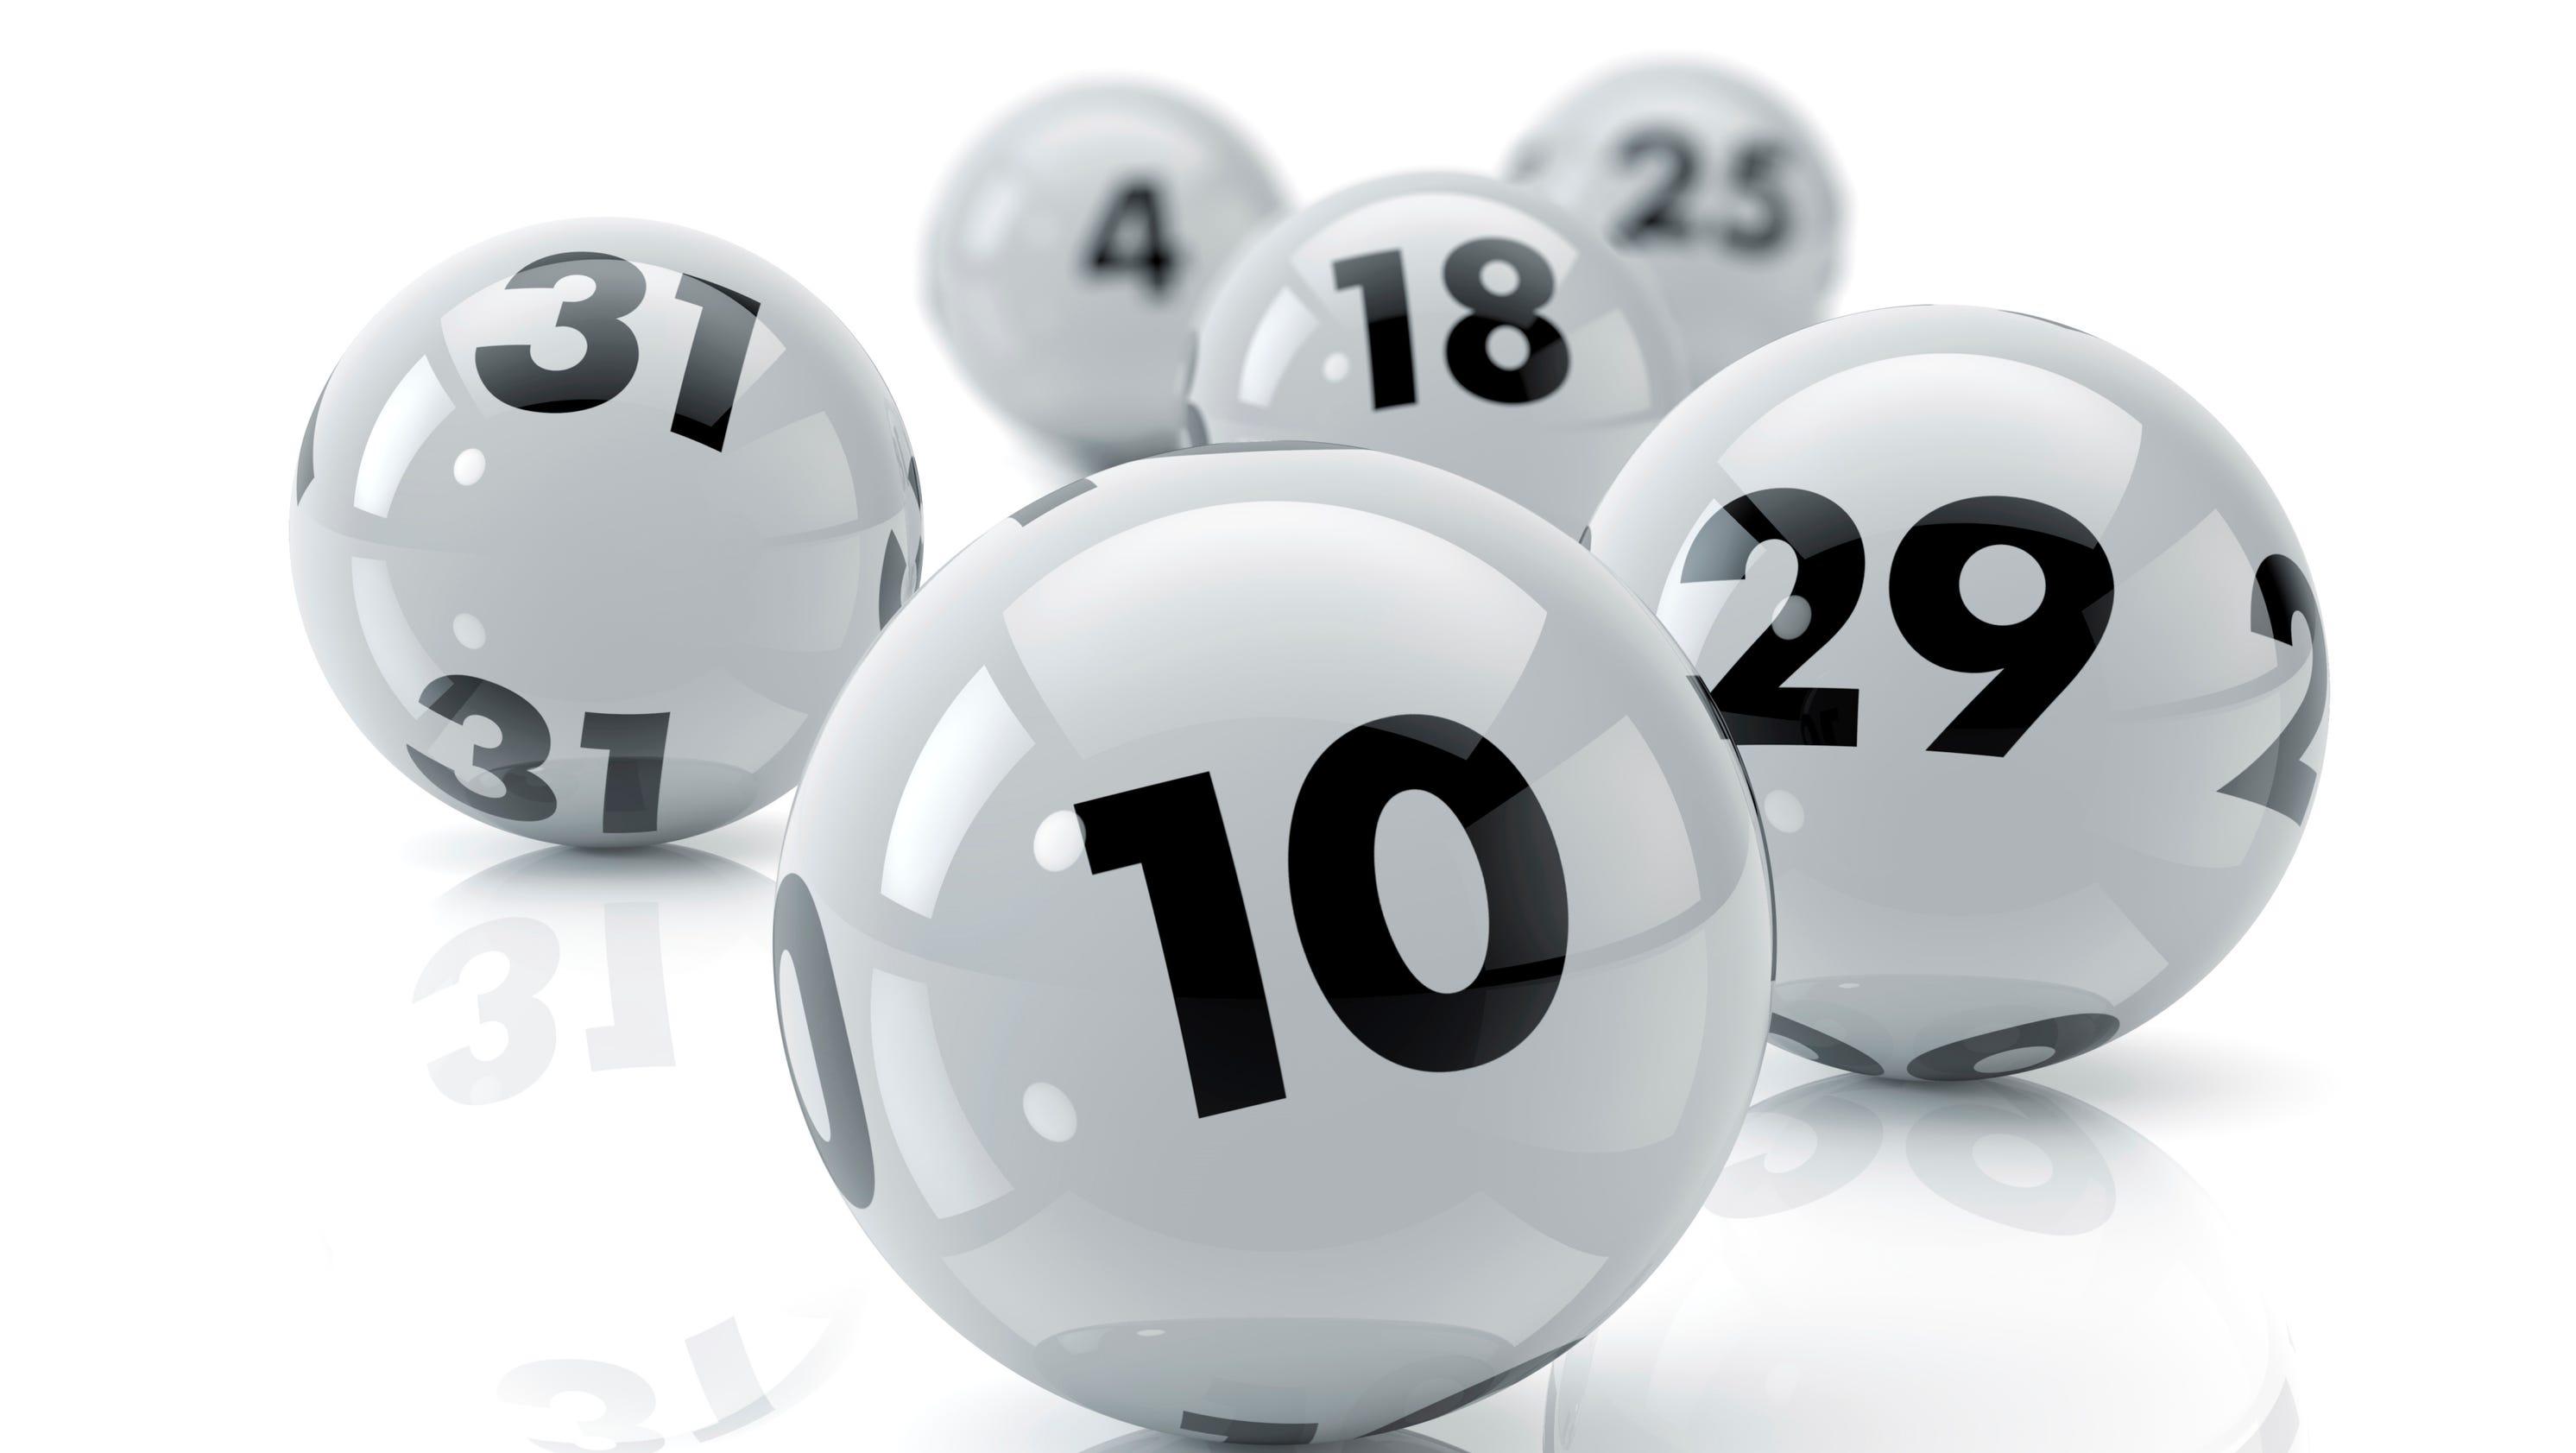 1 million powerball winner in delaware - Ball image download ...